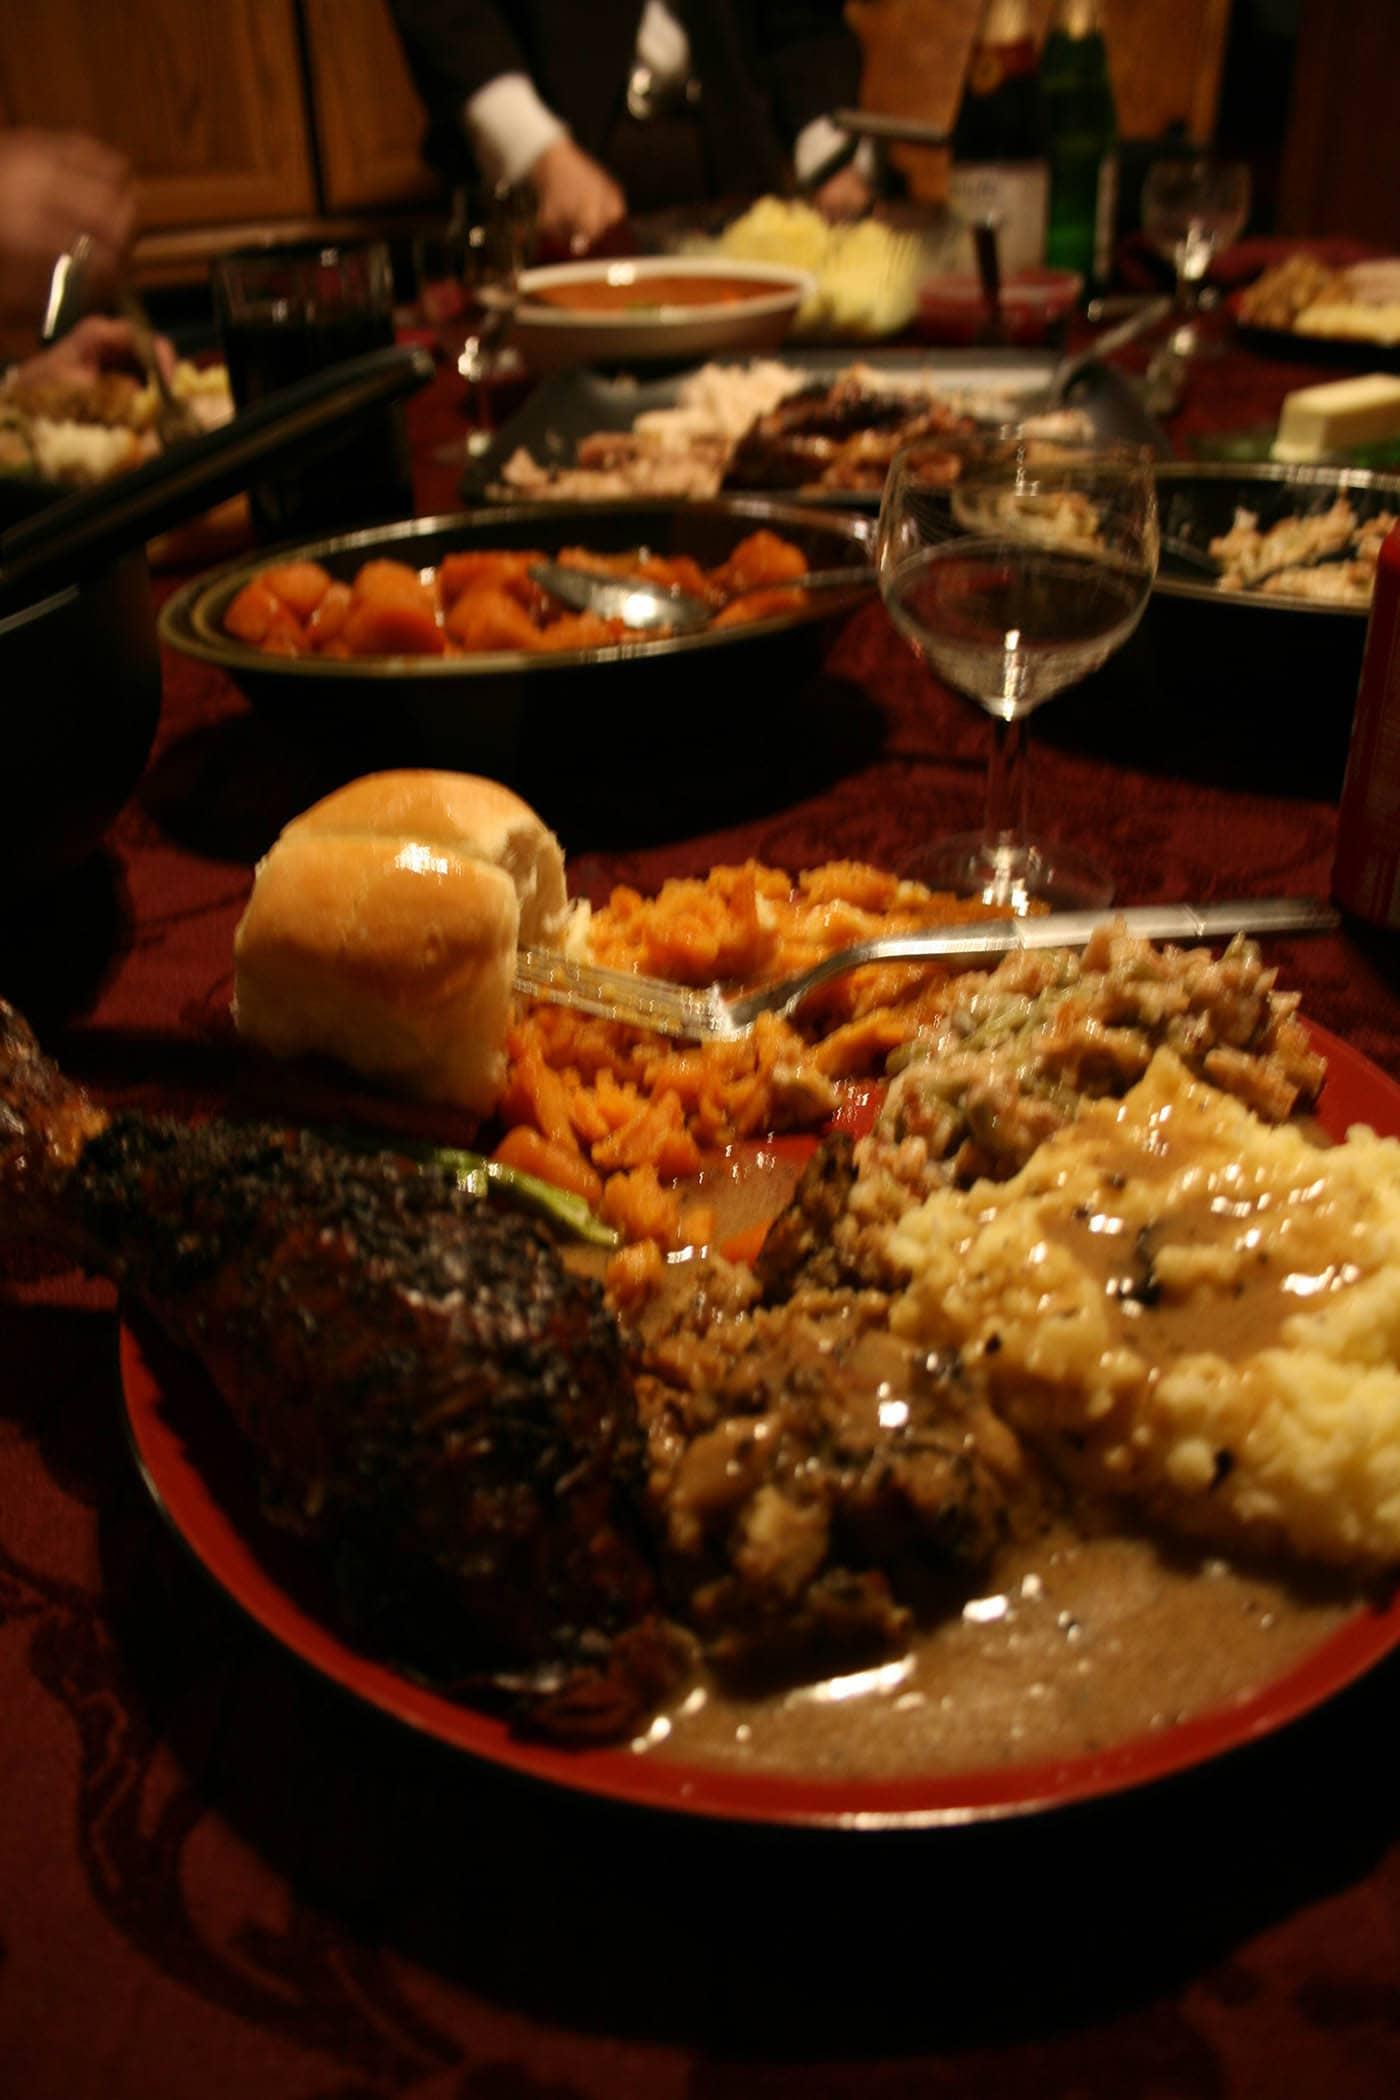 Happy Thanksgiving - turkey dinner